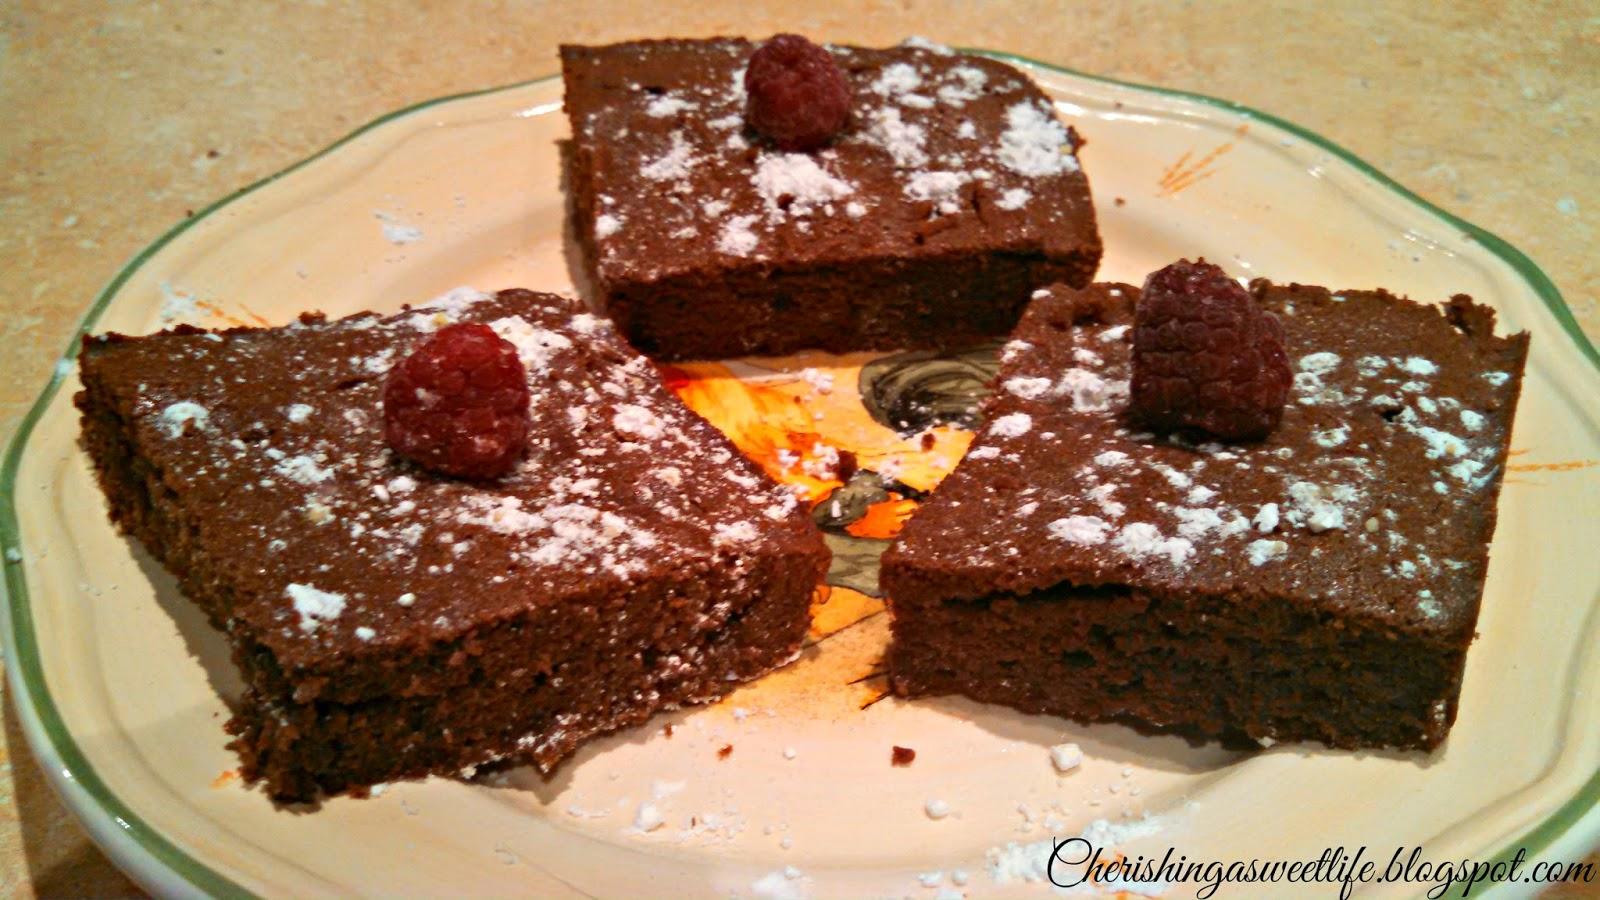 Cherishing A Sweet Life: Easy Dark Chocolate Nutella Brownies